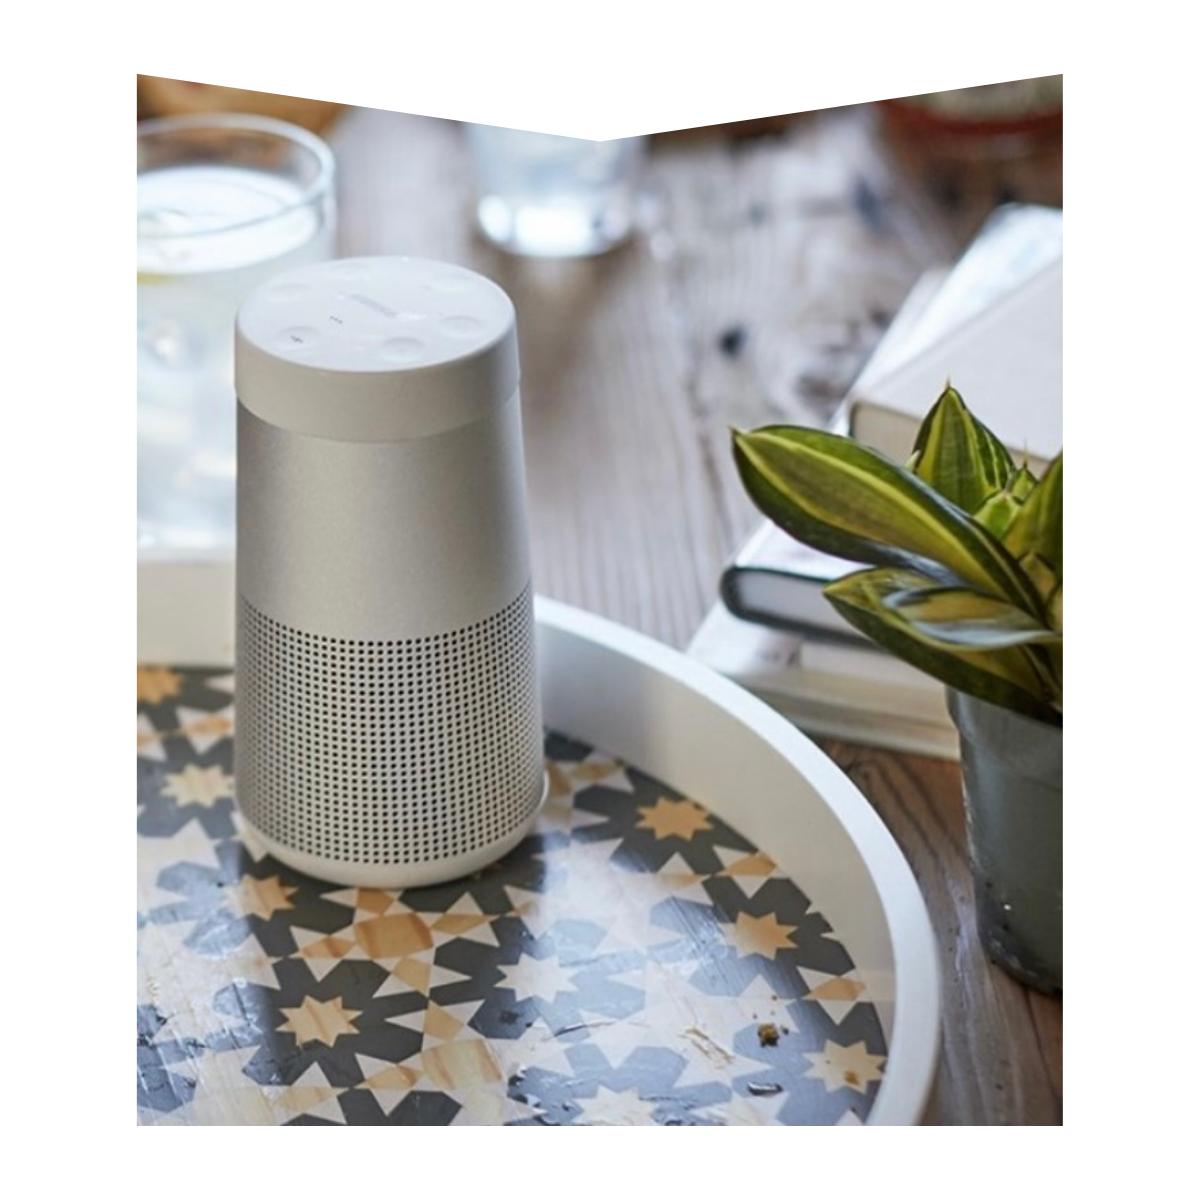 Bose Bluetooth Speaker The Source